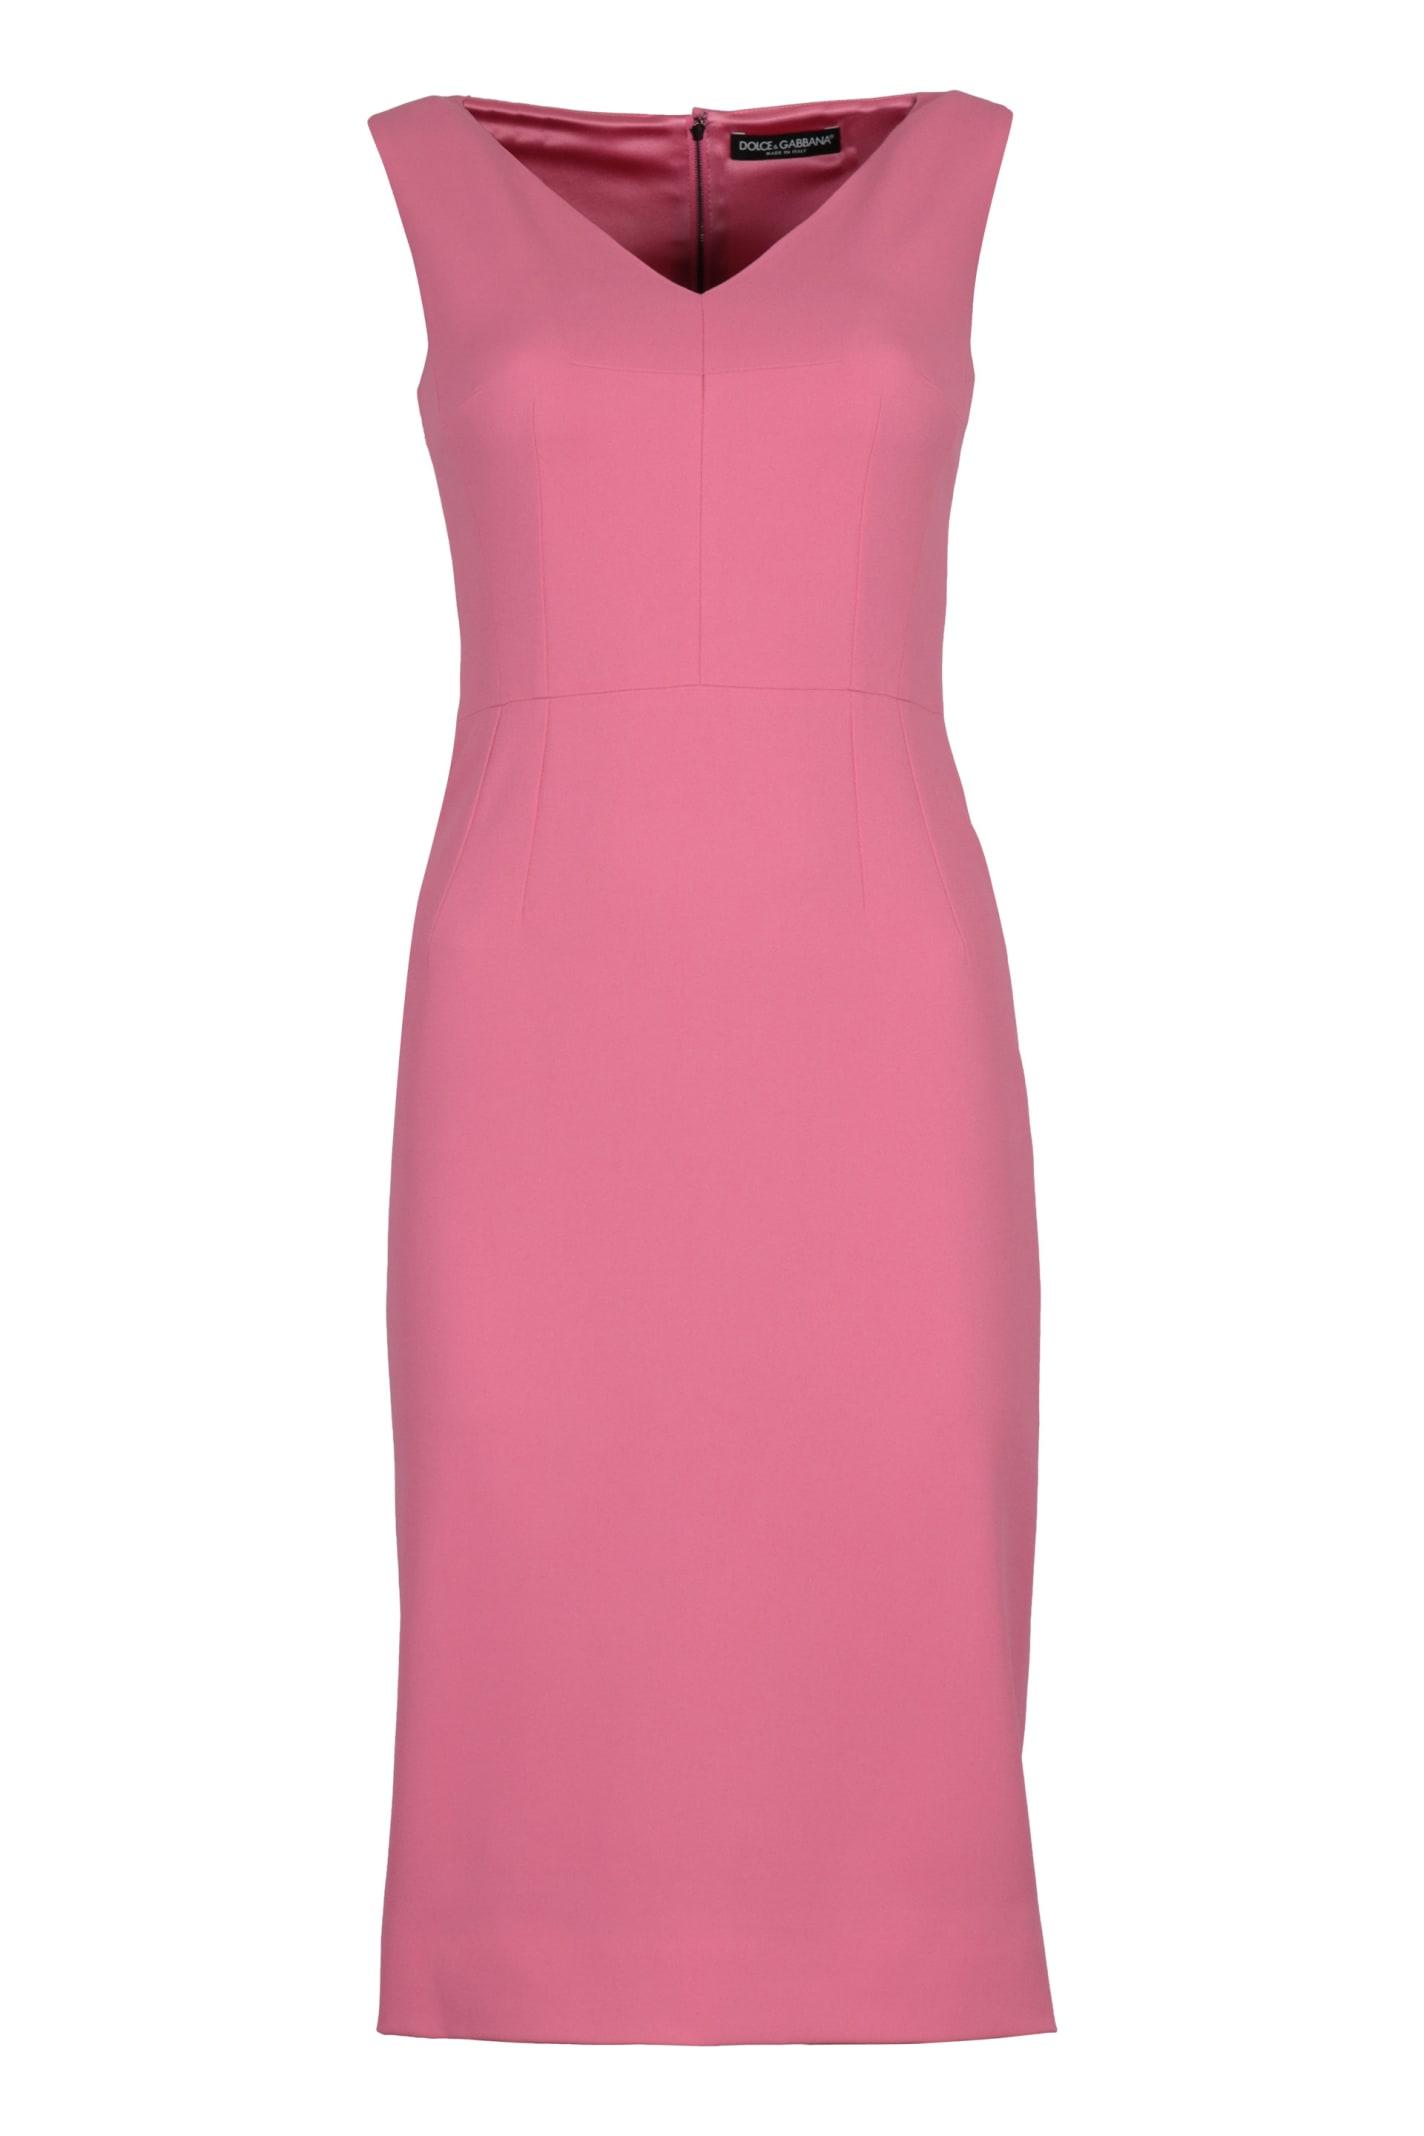 Buy Dolce & Gabbana Crepe Sheath Dress online, shop Dolce & Gabbana with free shipping